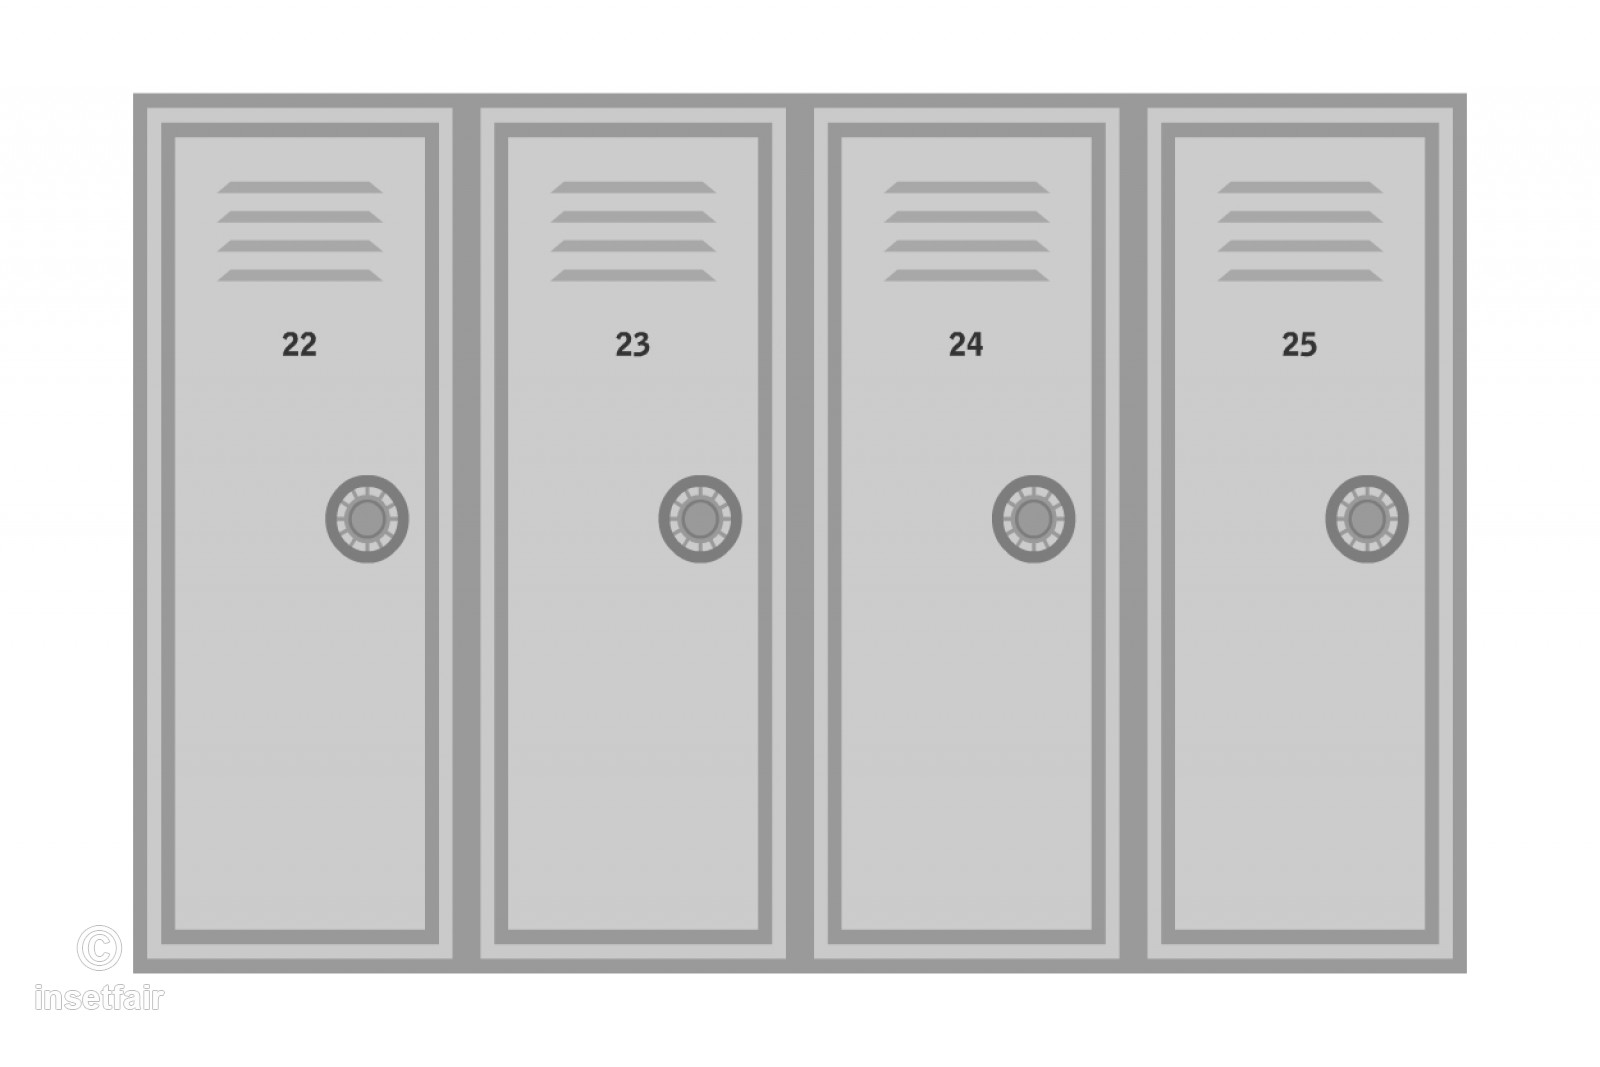 Locker clipart locker door. Bank wardrobe doors